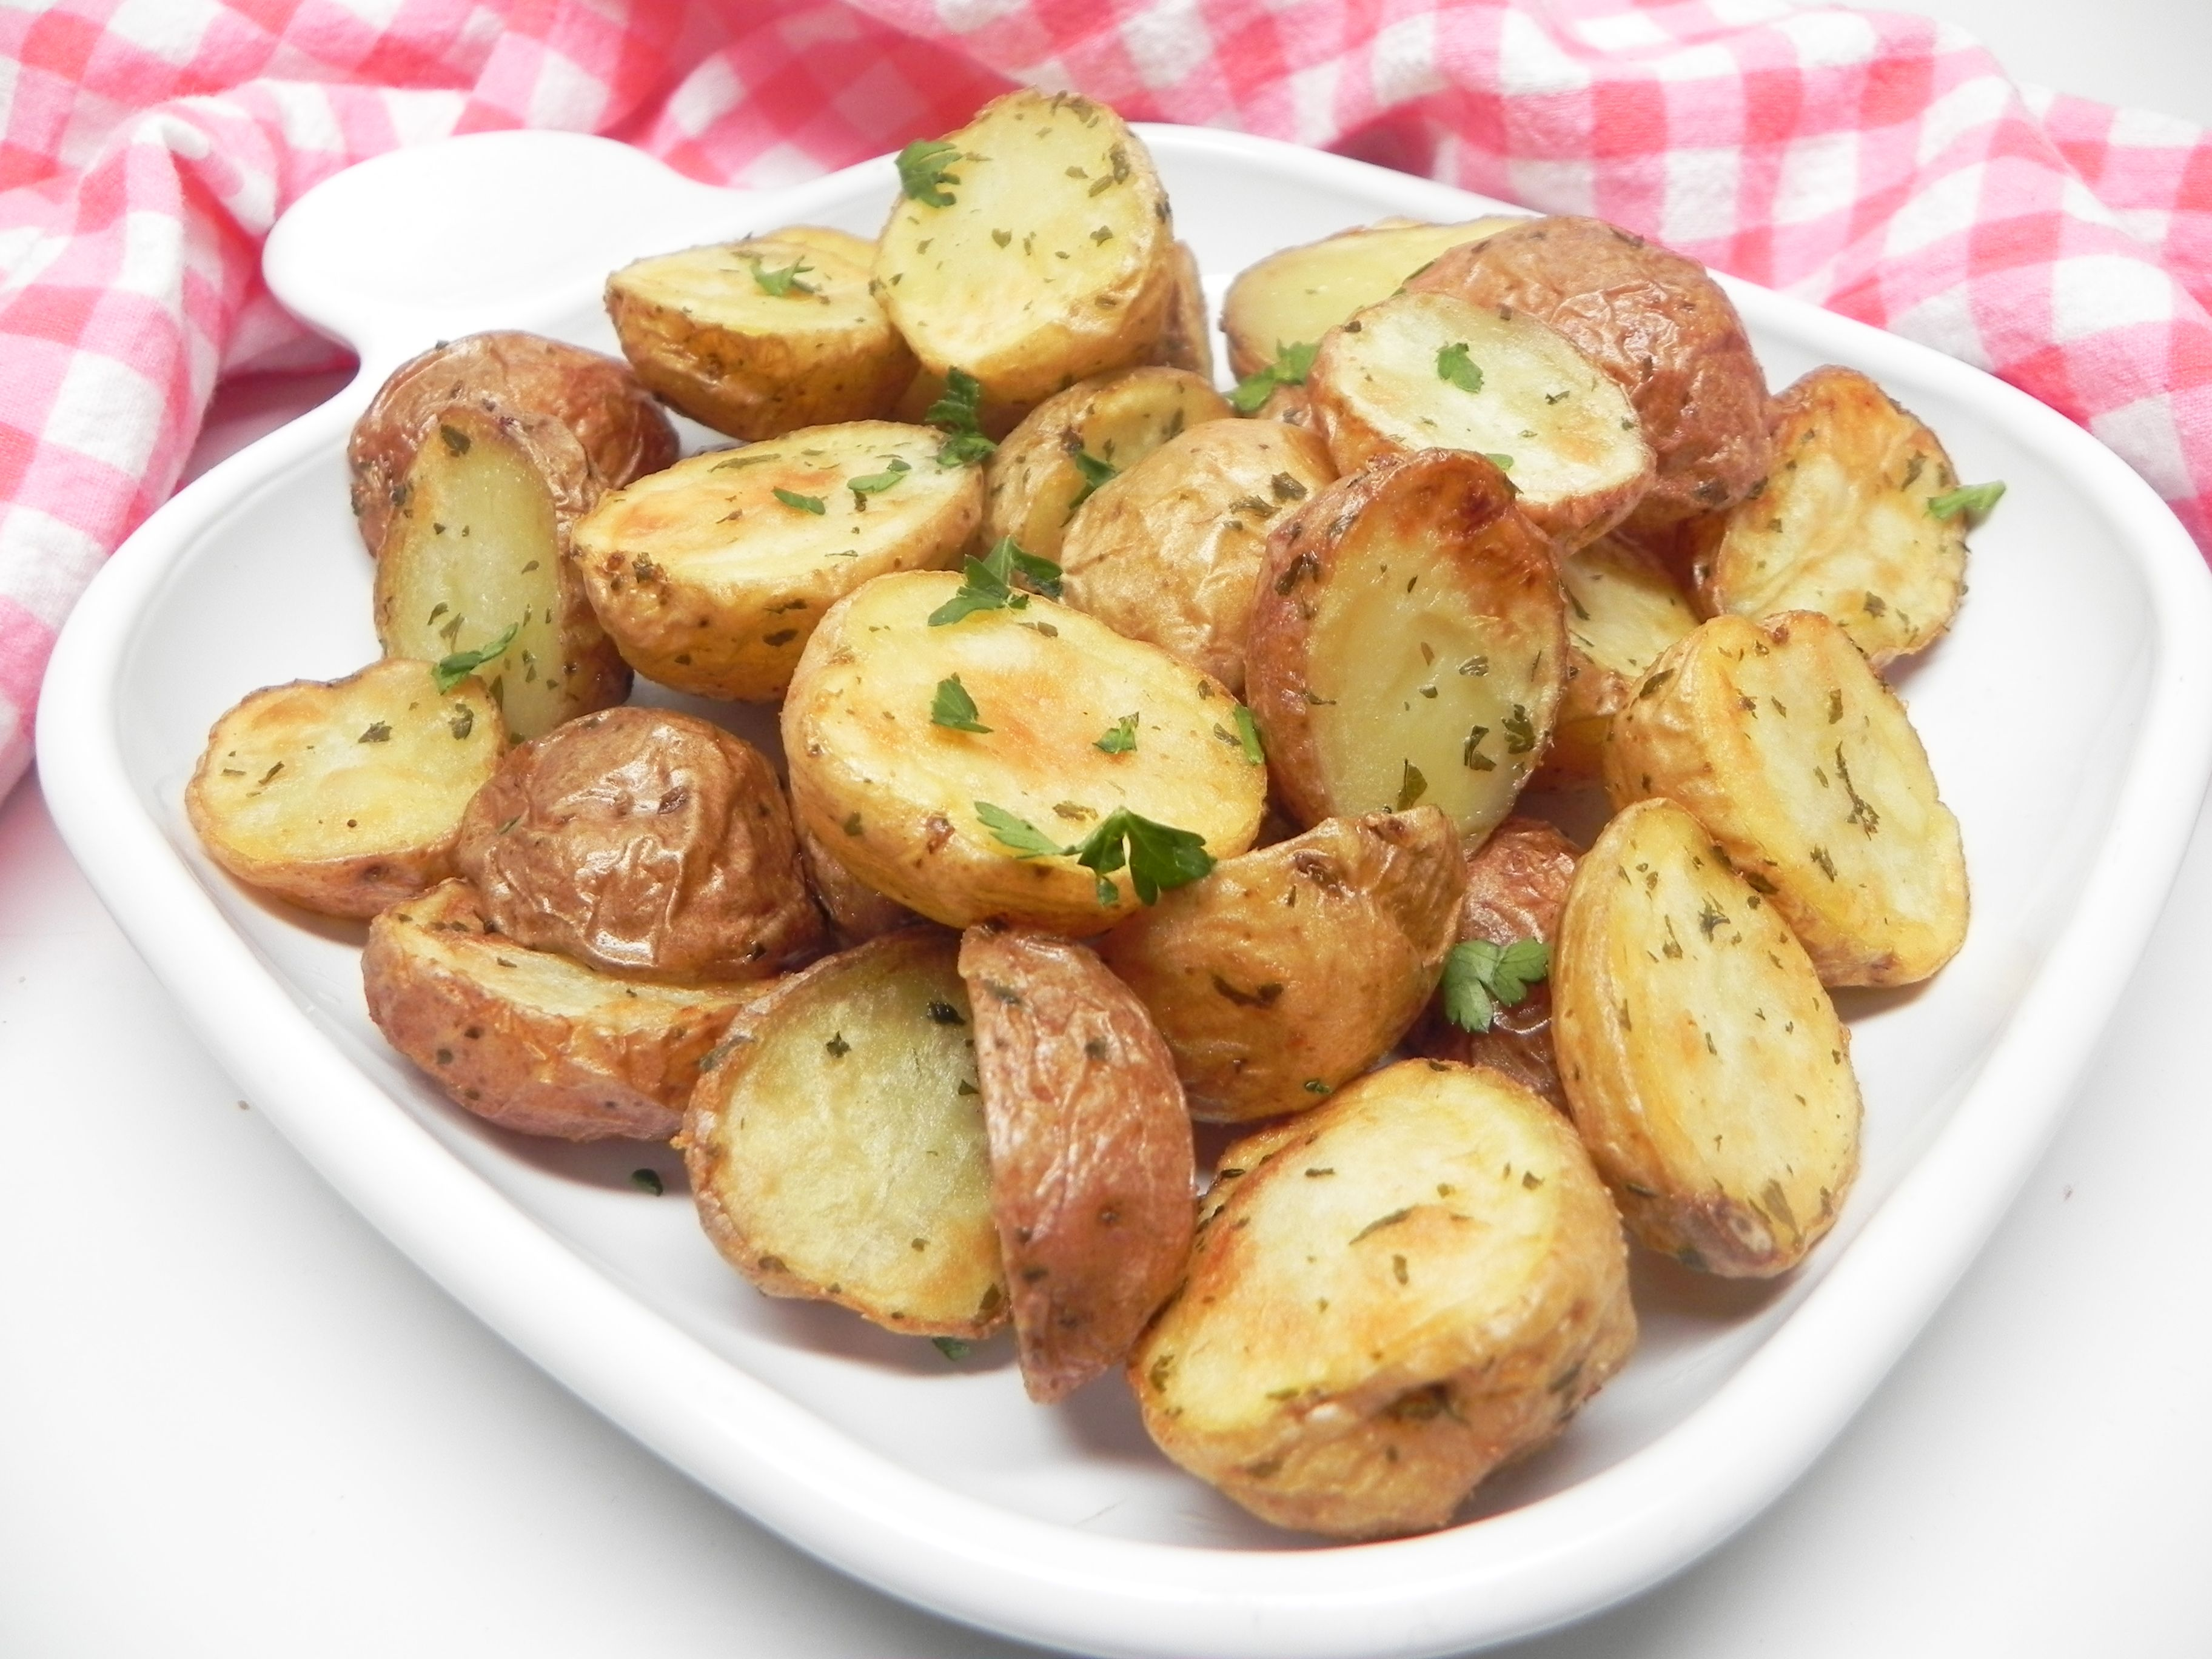 Air Fryer Garlic And Parsley Baby Potatoes Recipe Baby Potatoes Baby Potato Recipes Potatoes